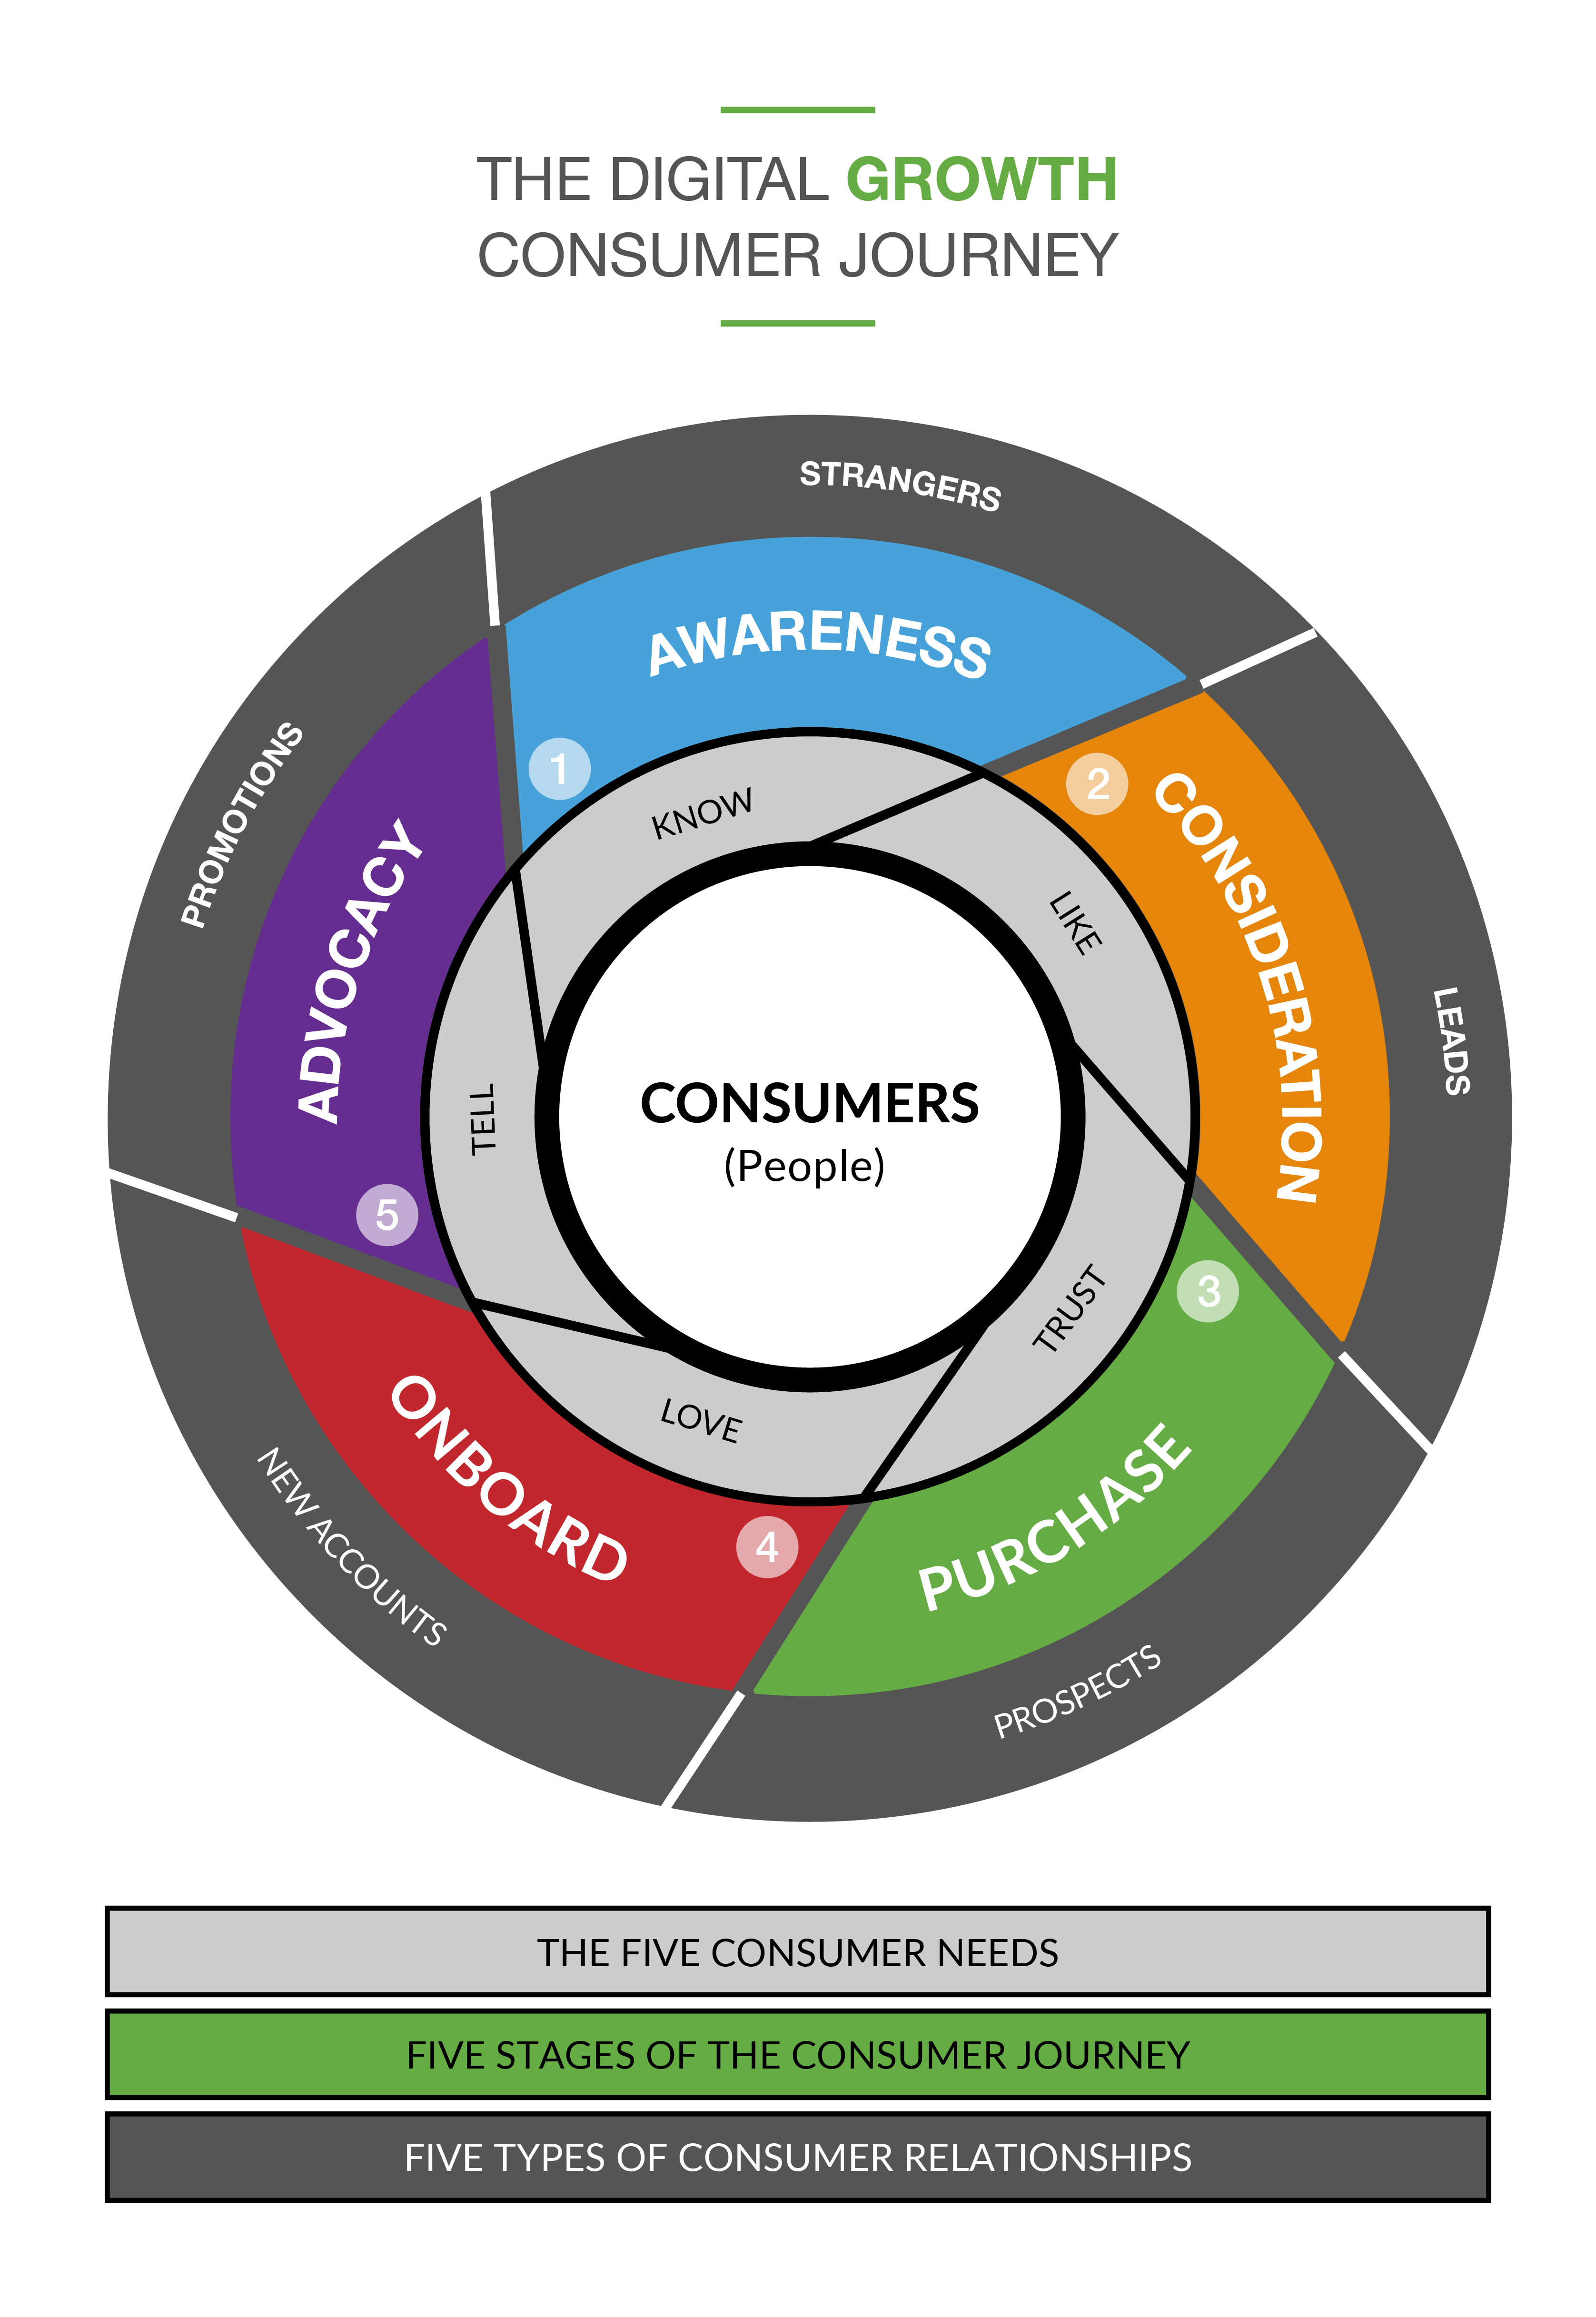 Digital Growth Consume Journey